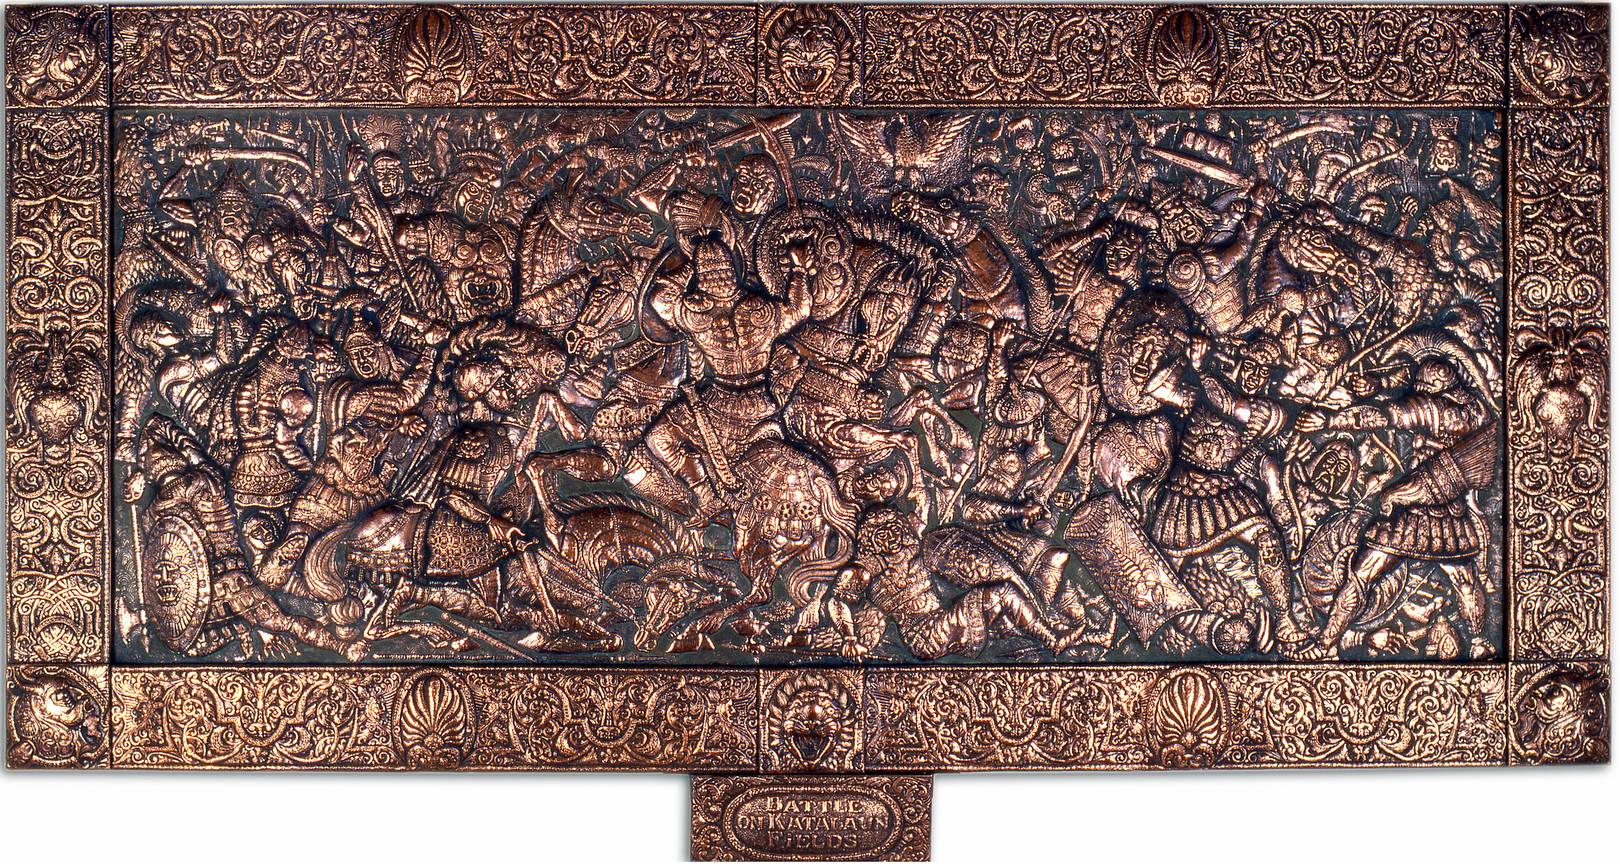 Битва на Каталаунских полях (панно) 1992 г. Медь; чернение 96 х 176 см